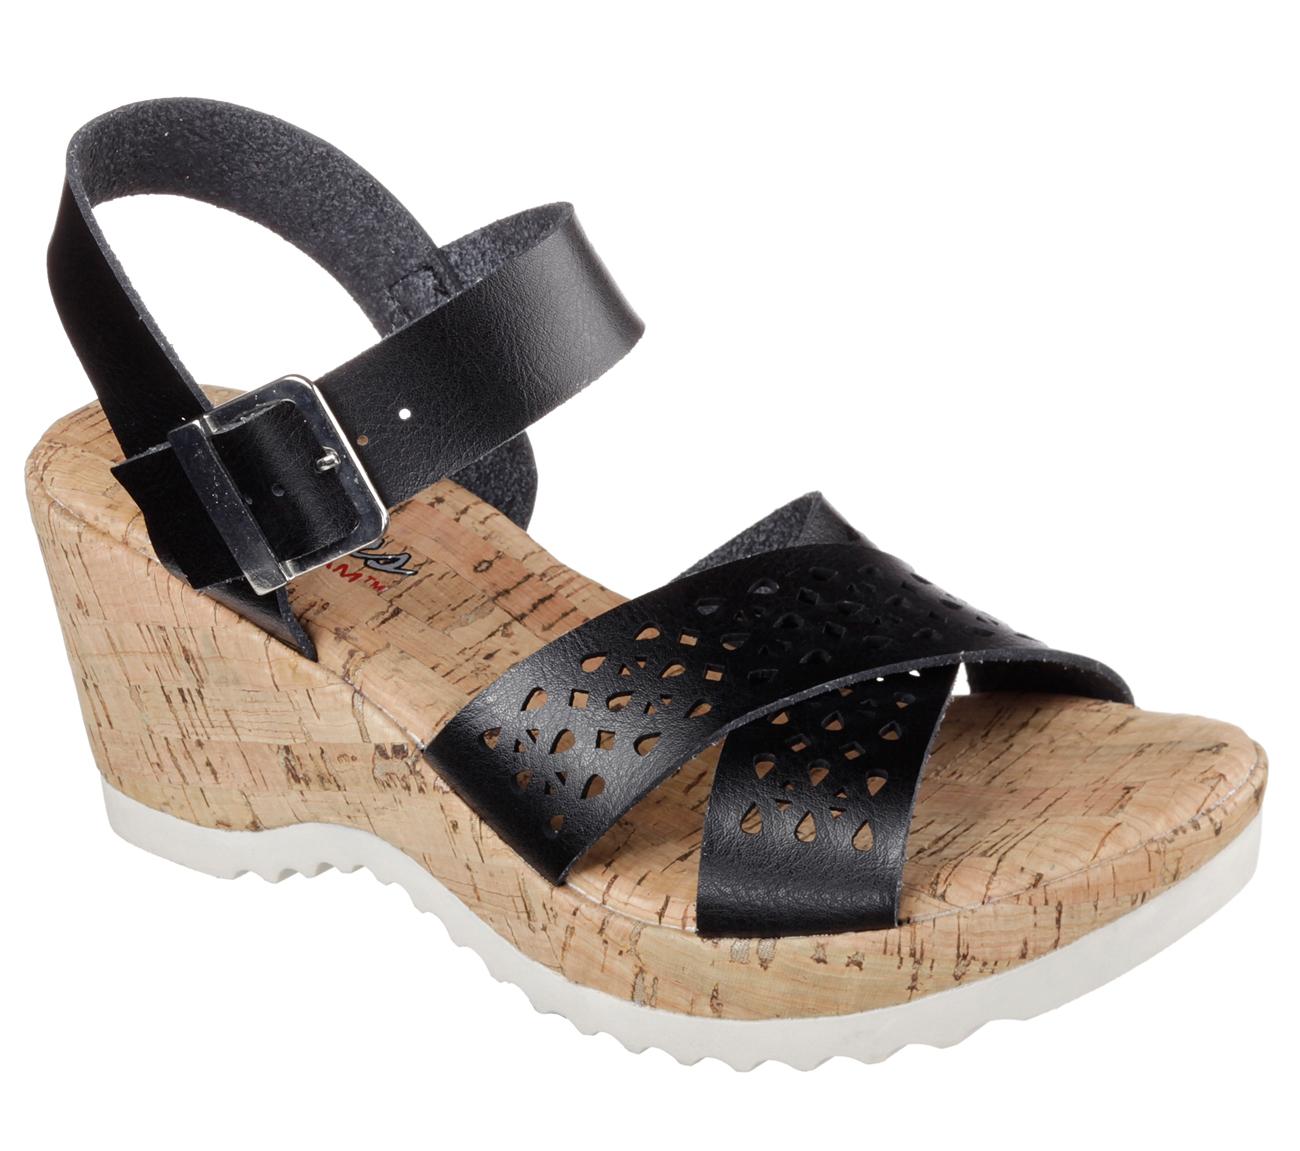 Skechers canada online shopping